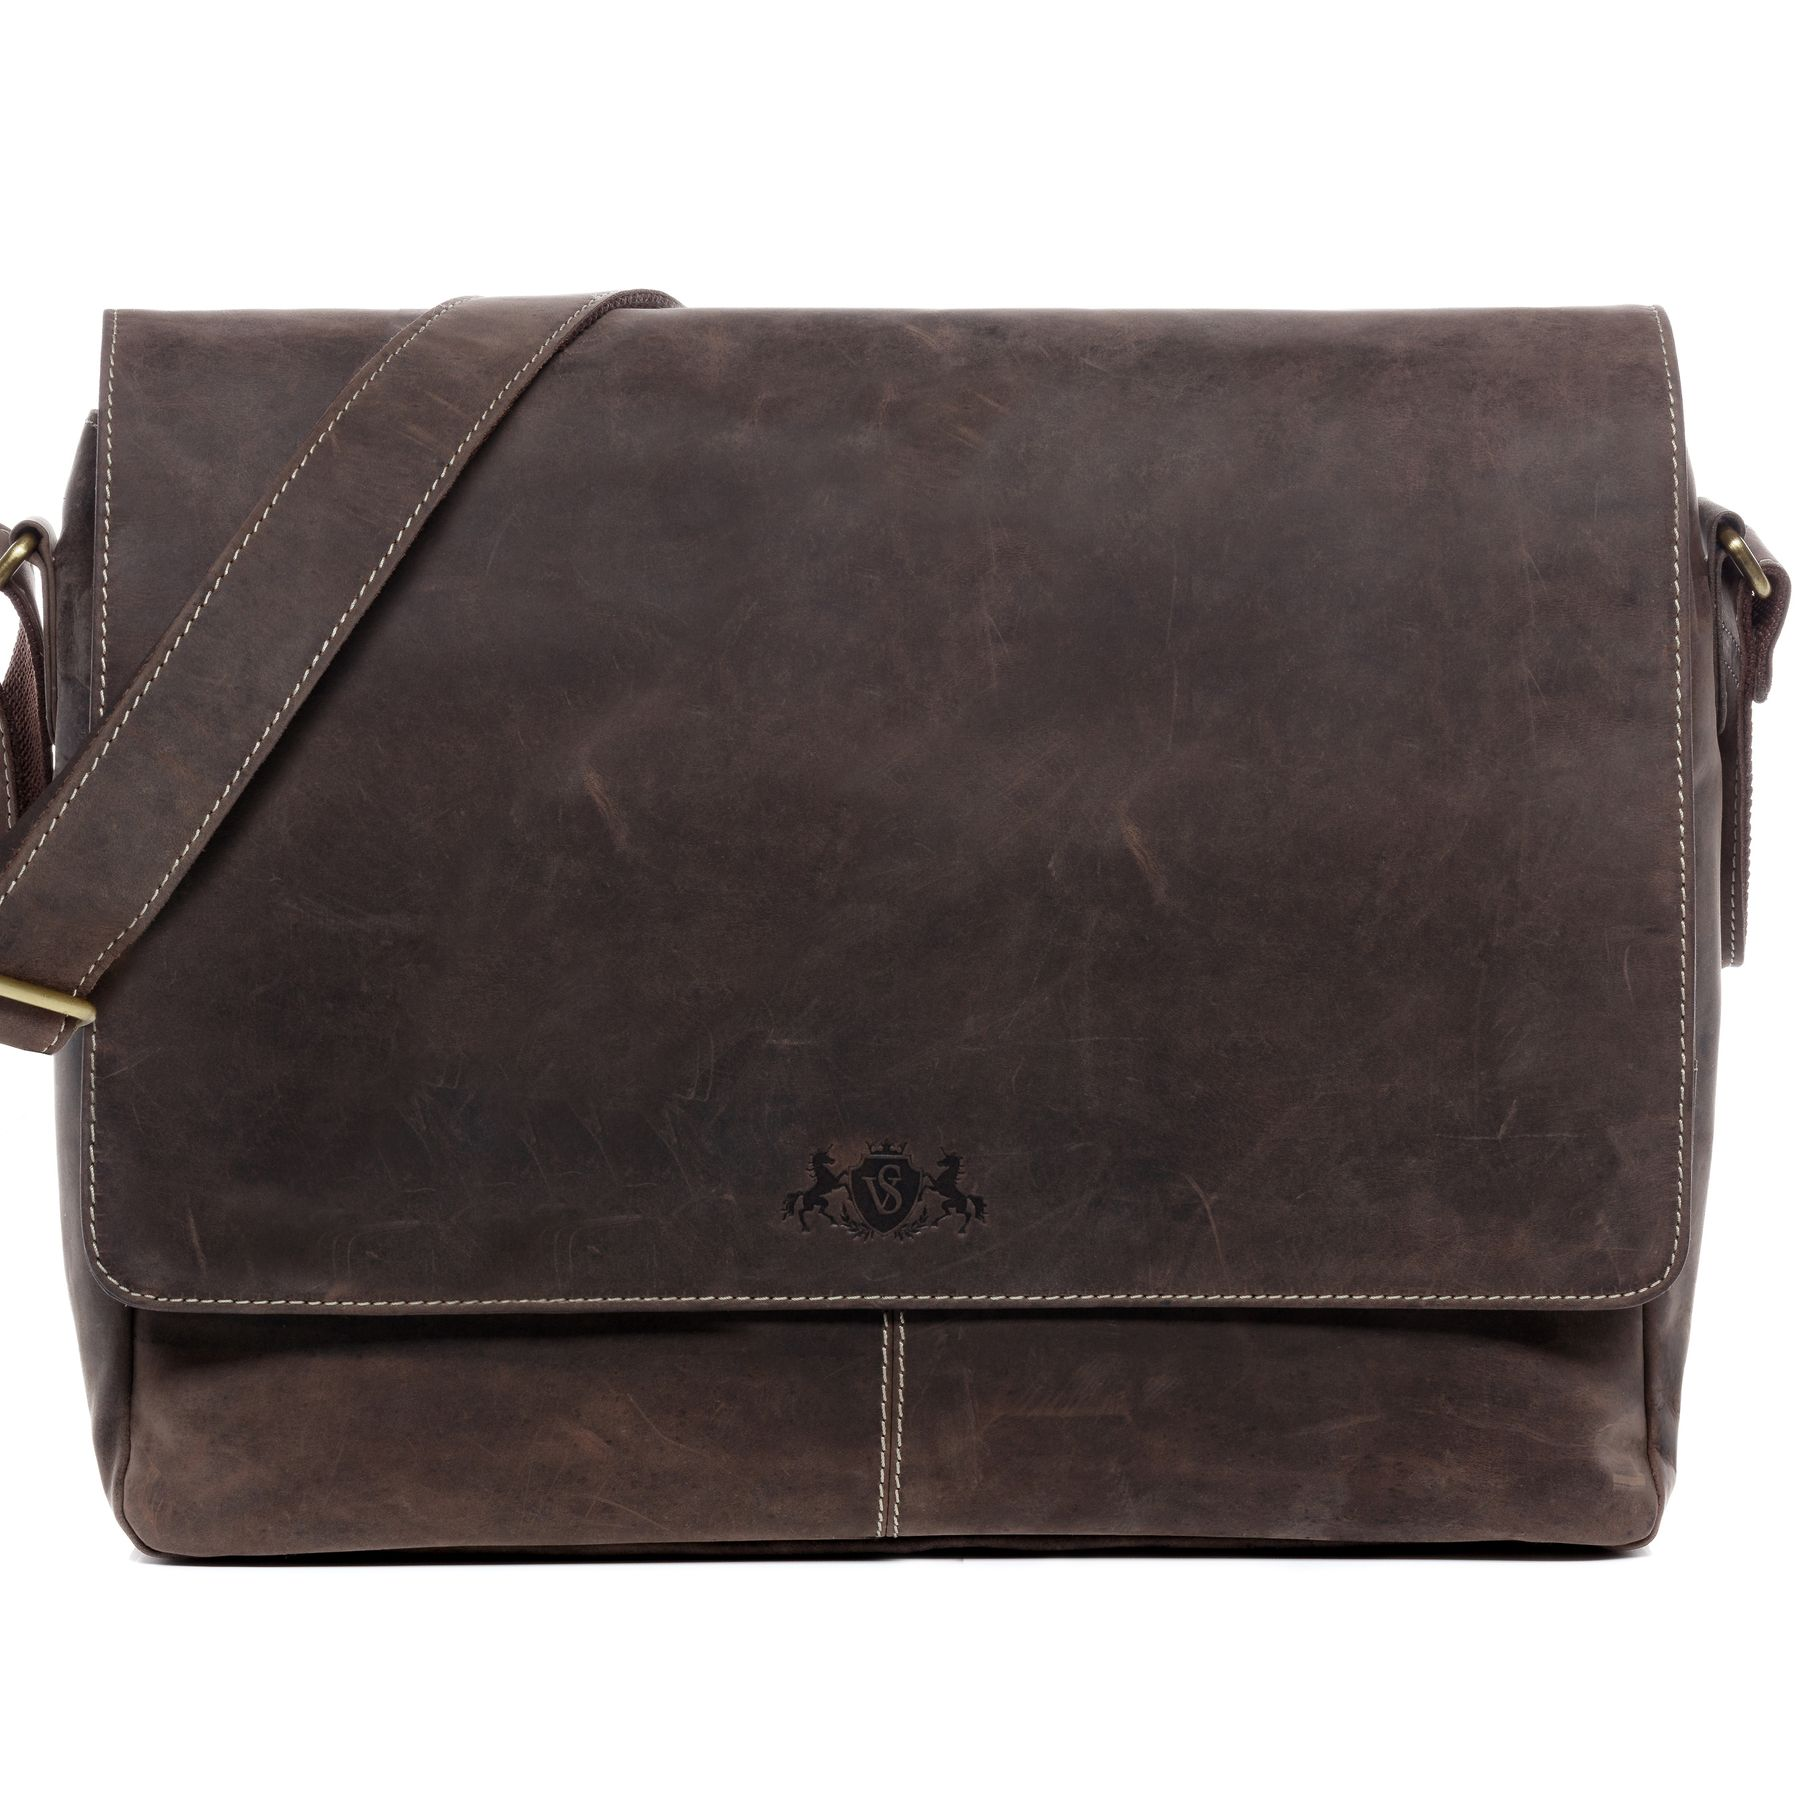 SID   VAIN messenger bag SPENCER 15   shoulder bag L brown Smooth Leather  laptop courier cross-body bag Business Briefcases ce31caa7fbe